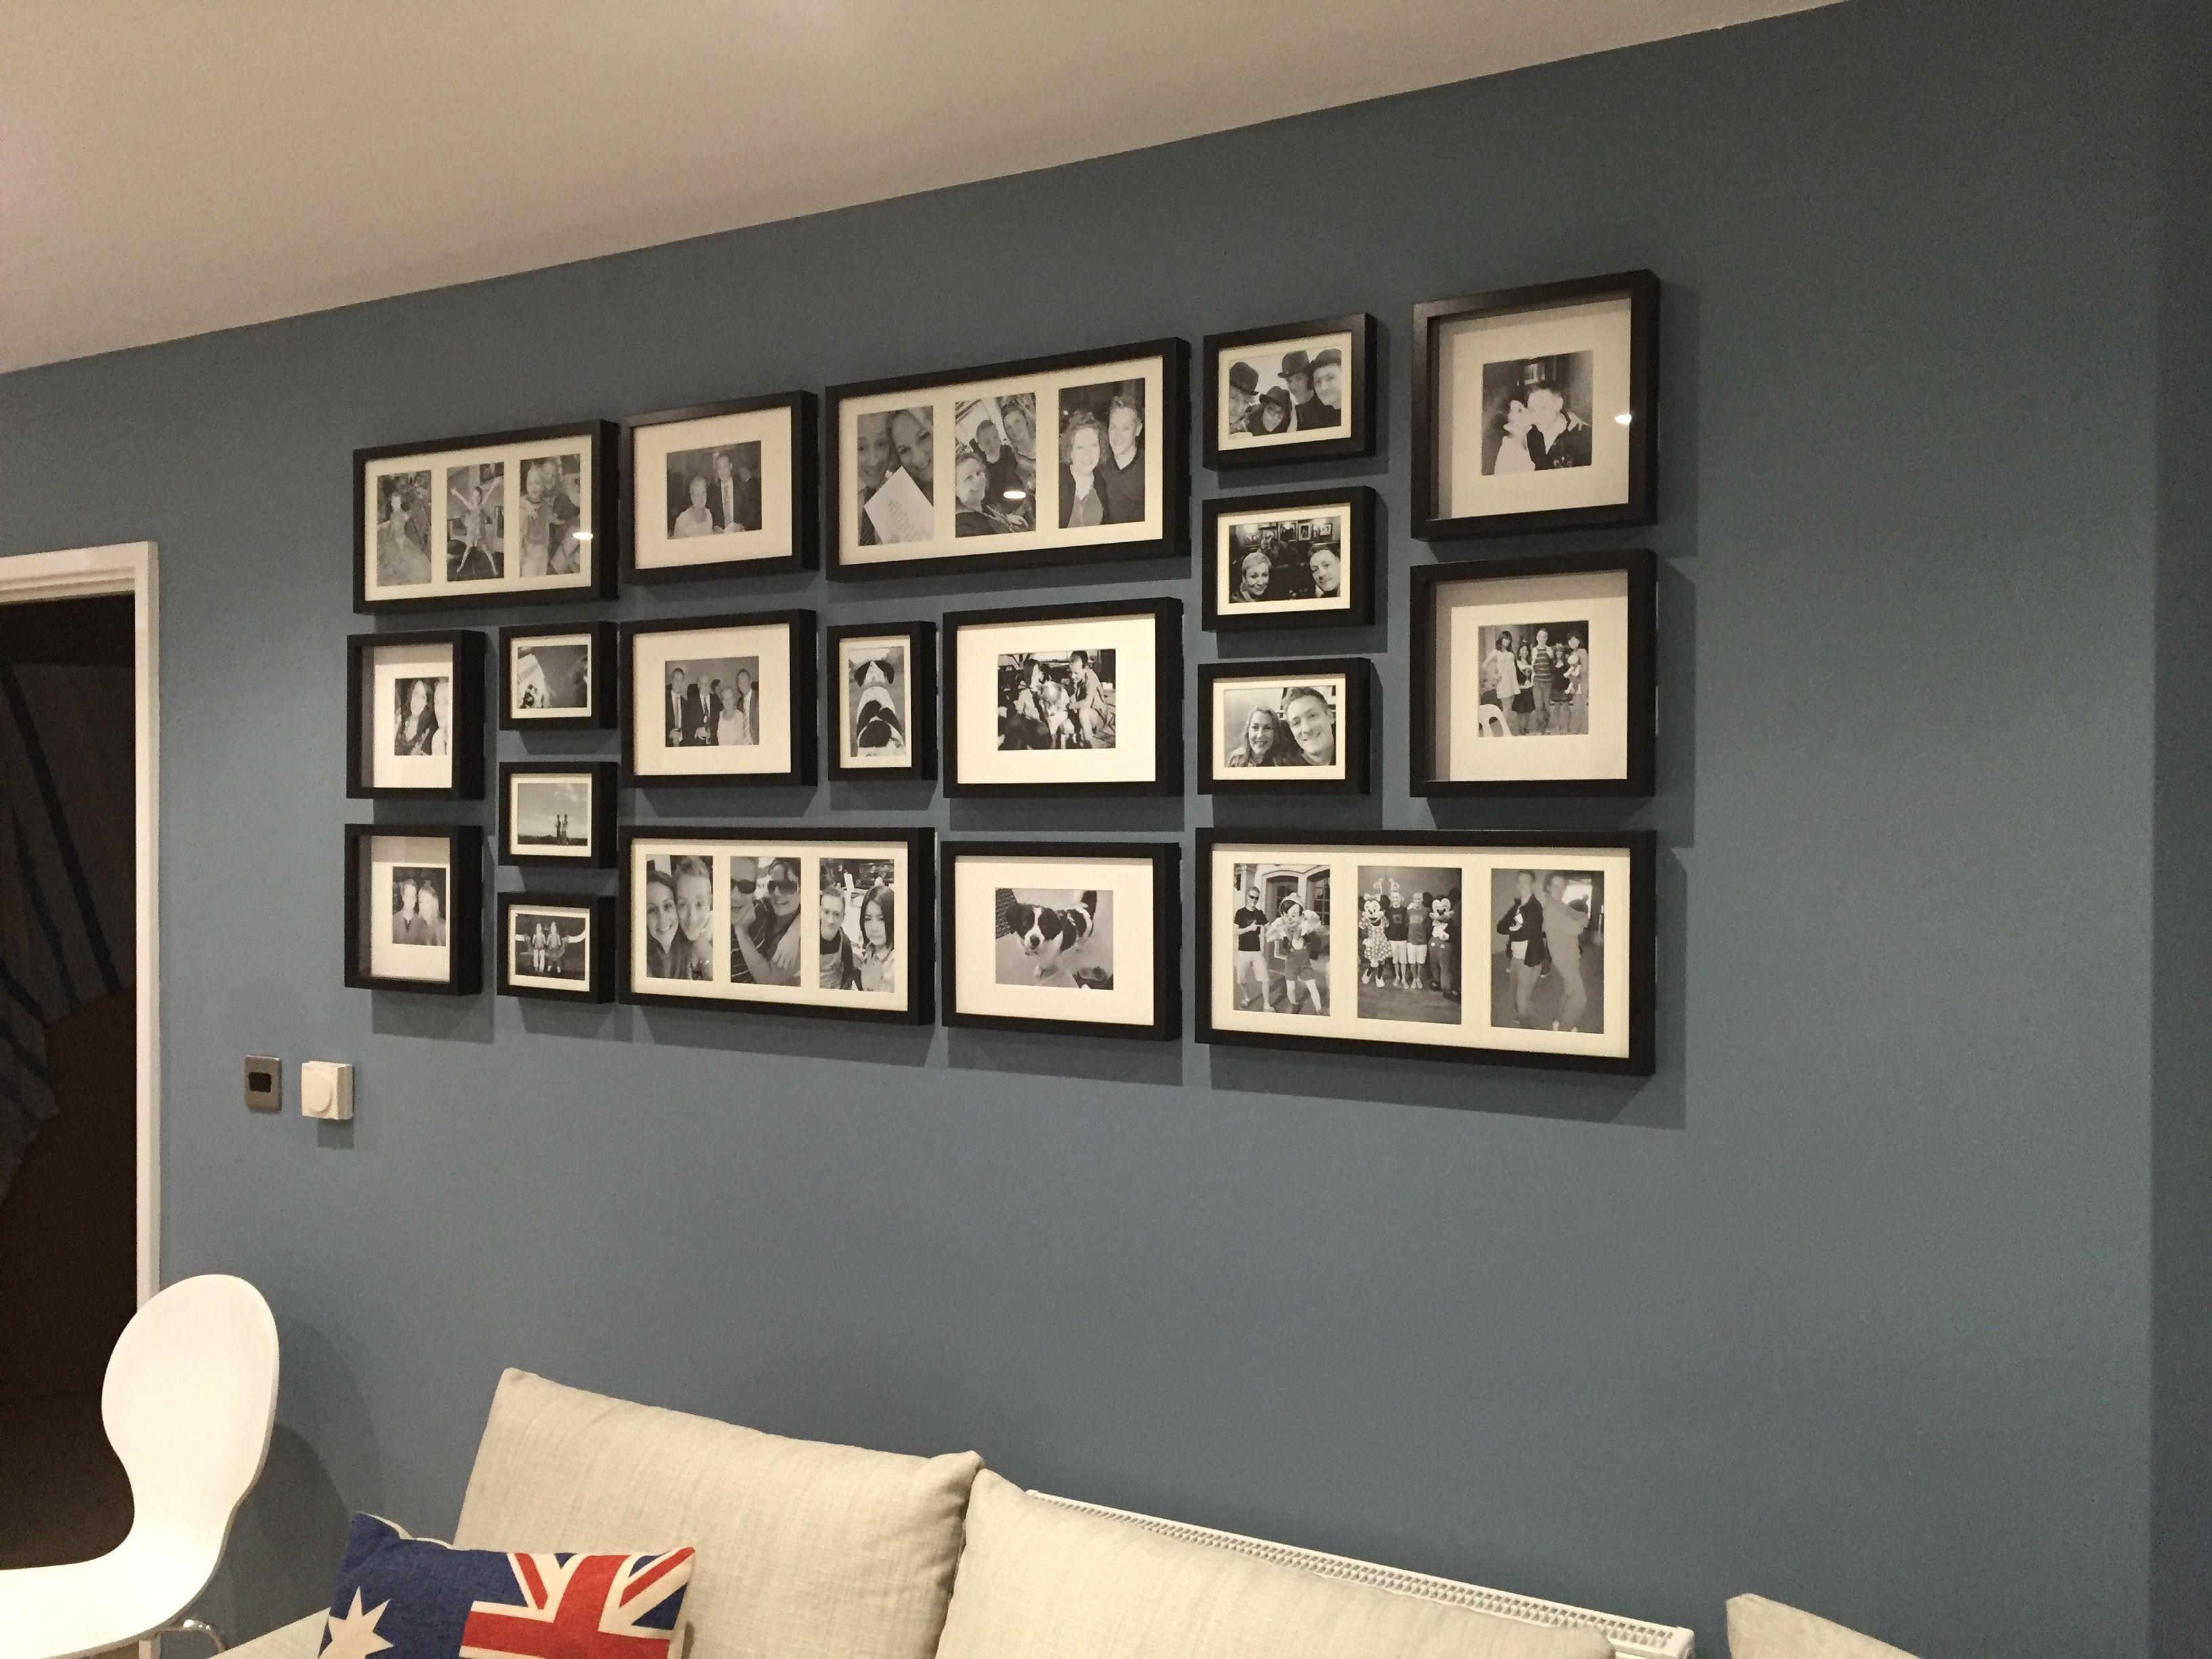 Wall - Ikea Ribba Frames Living Room Frame